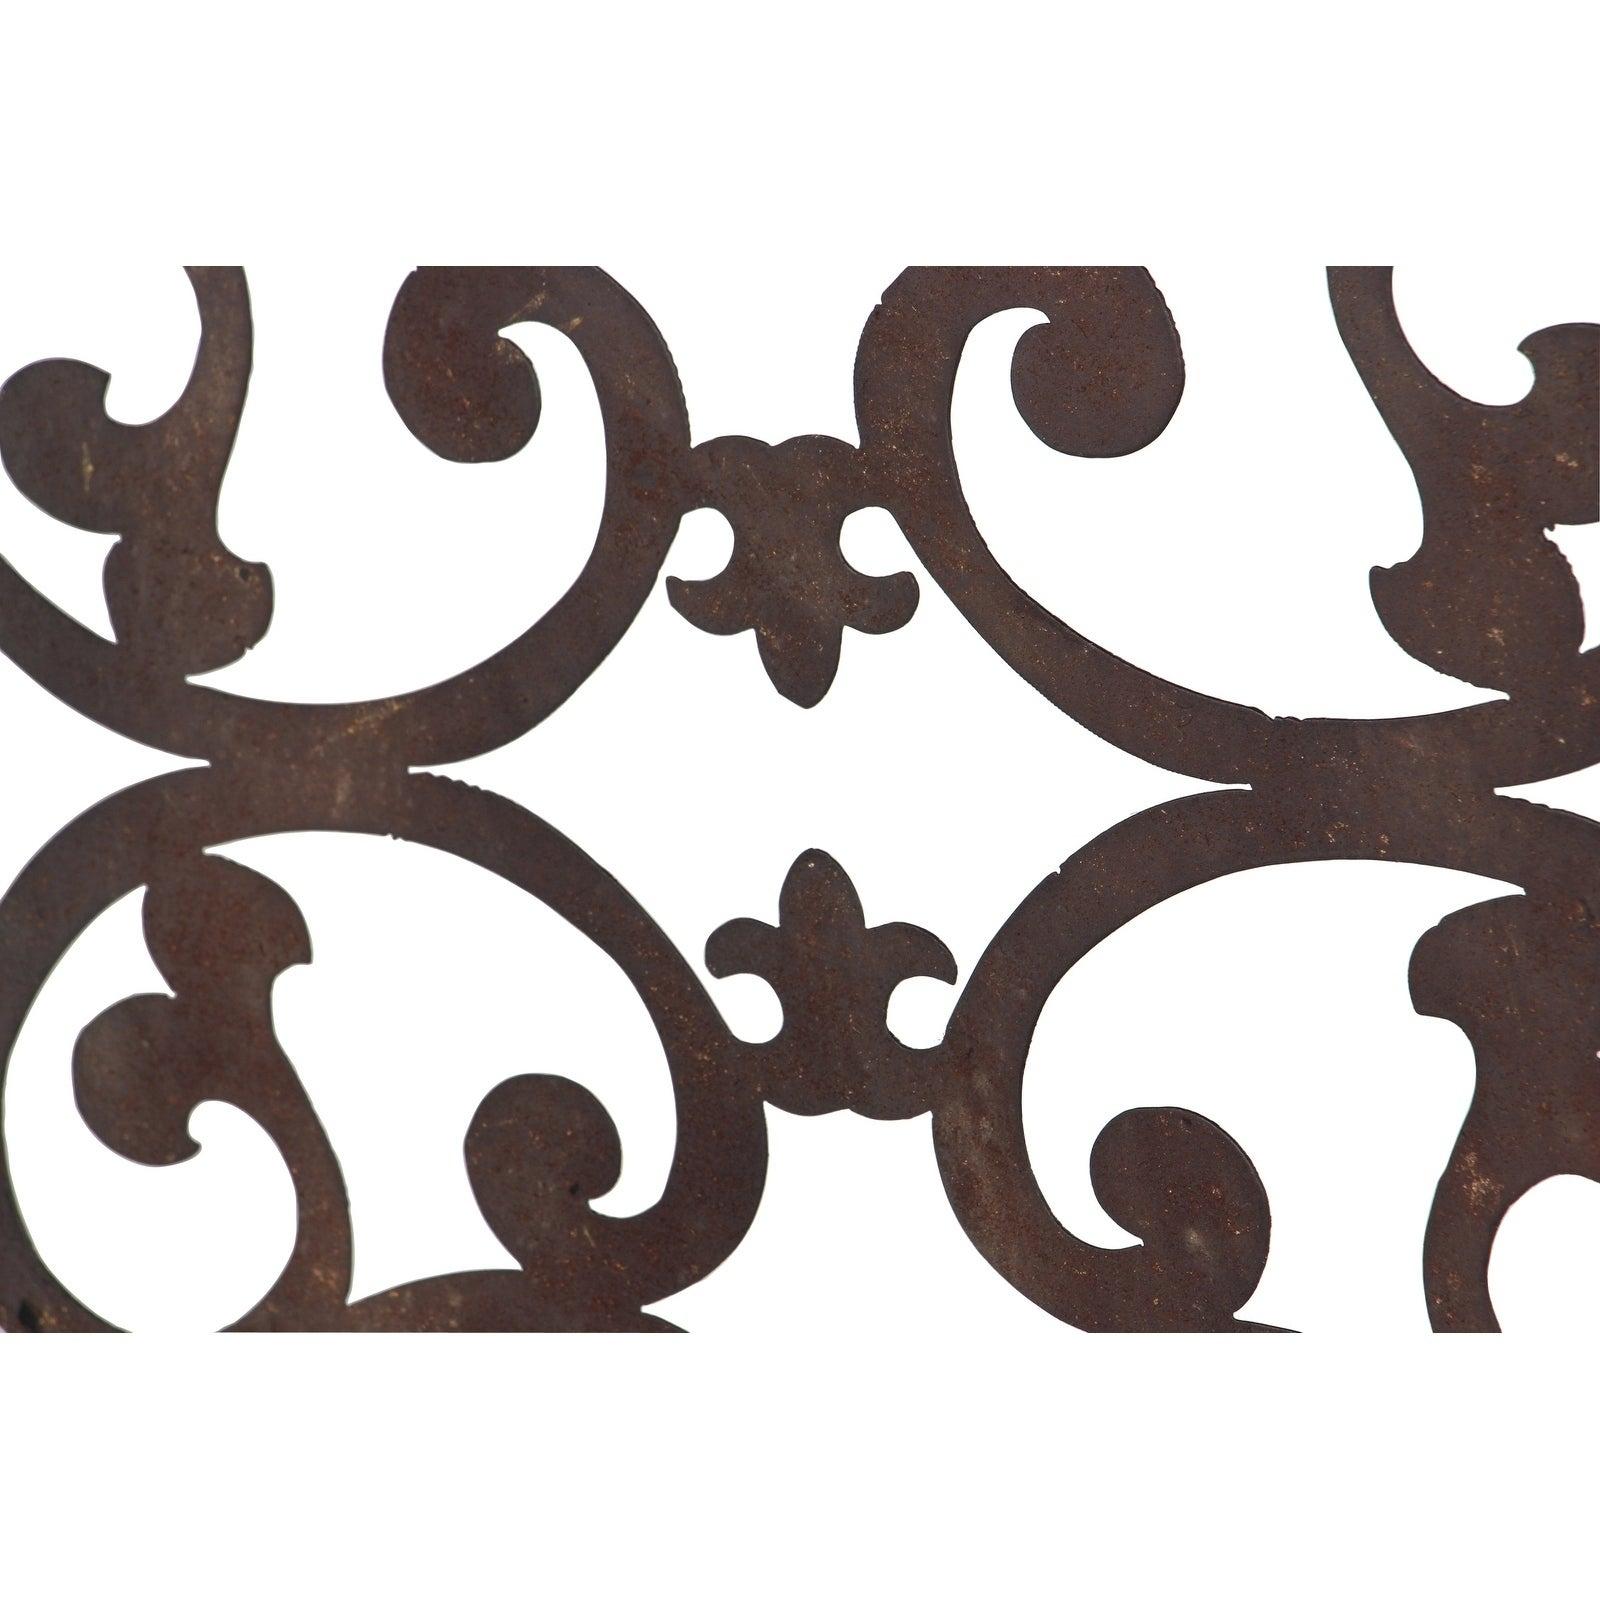 "26"" X 46"" Distressed Wood & Brown Metal Wall Art Panel W/ Scroll Design Studio 35 Inside Ornamental Wood And Metal Scroll Wall Decor (Gallery 22 of 30)"